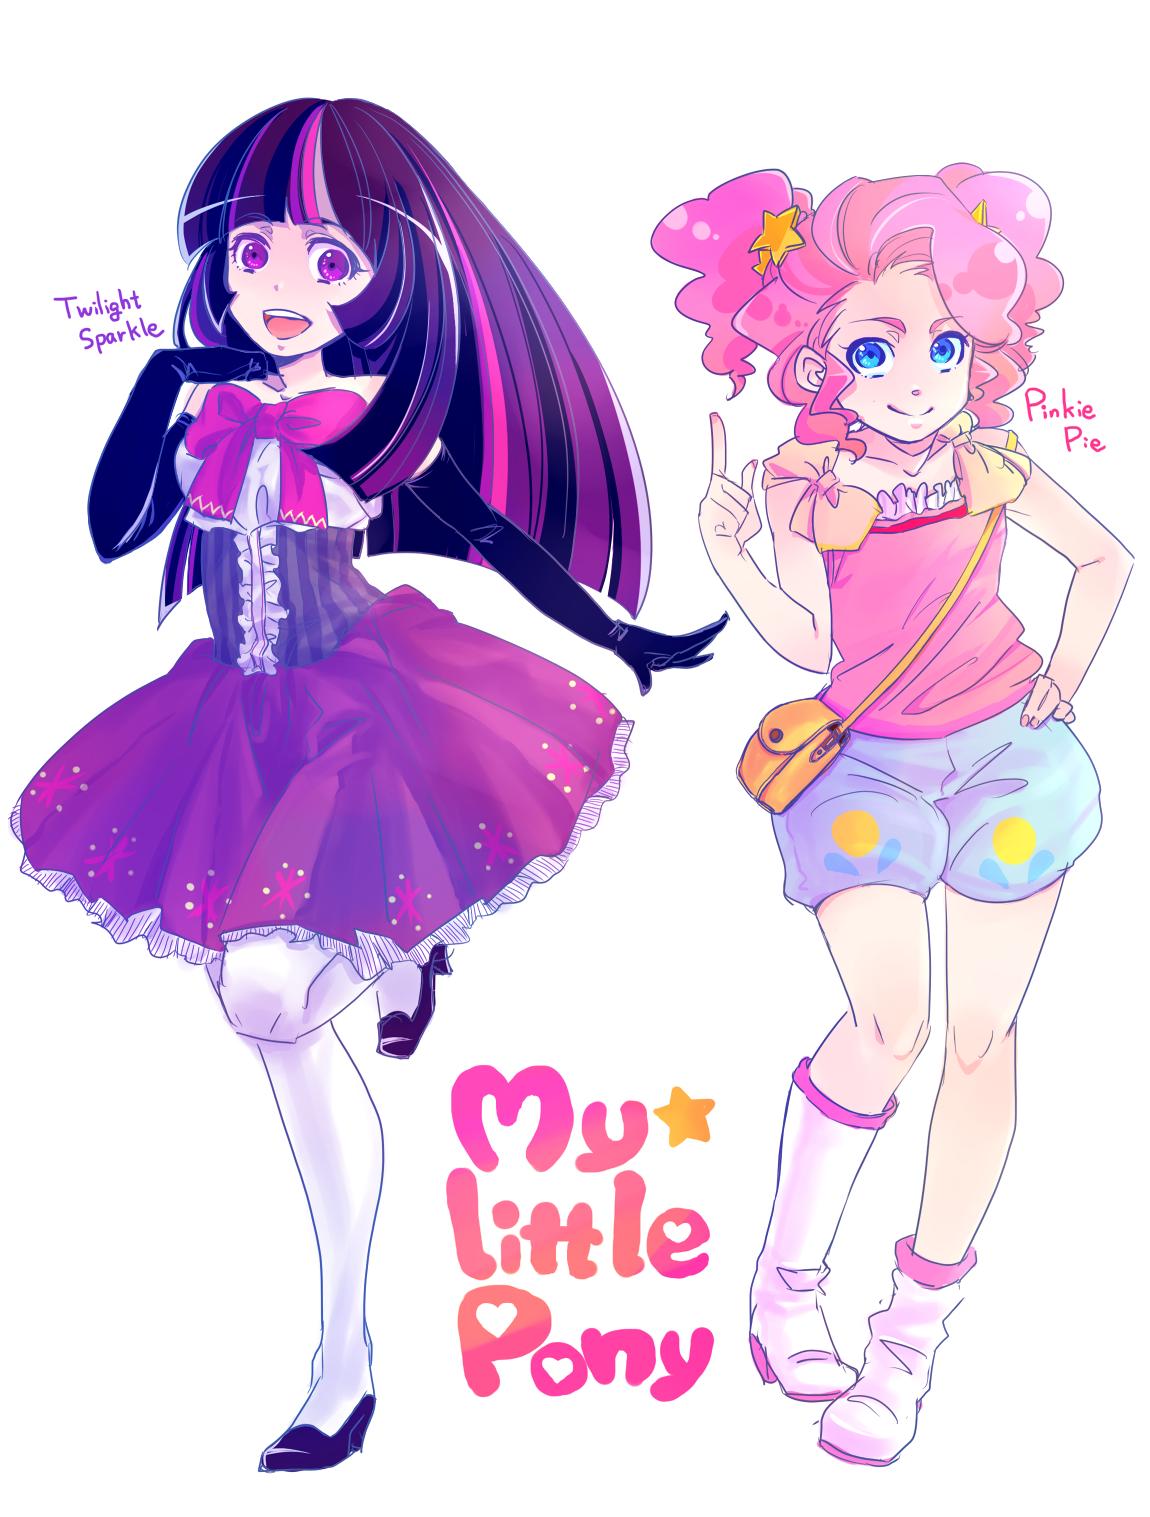 Super cute humanised Twilight and Pinkie Pie. I like a